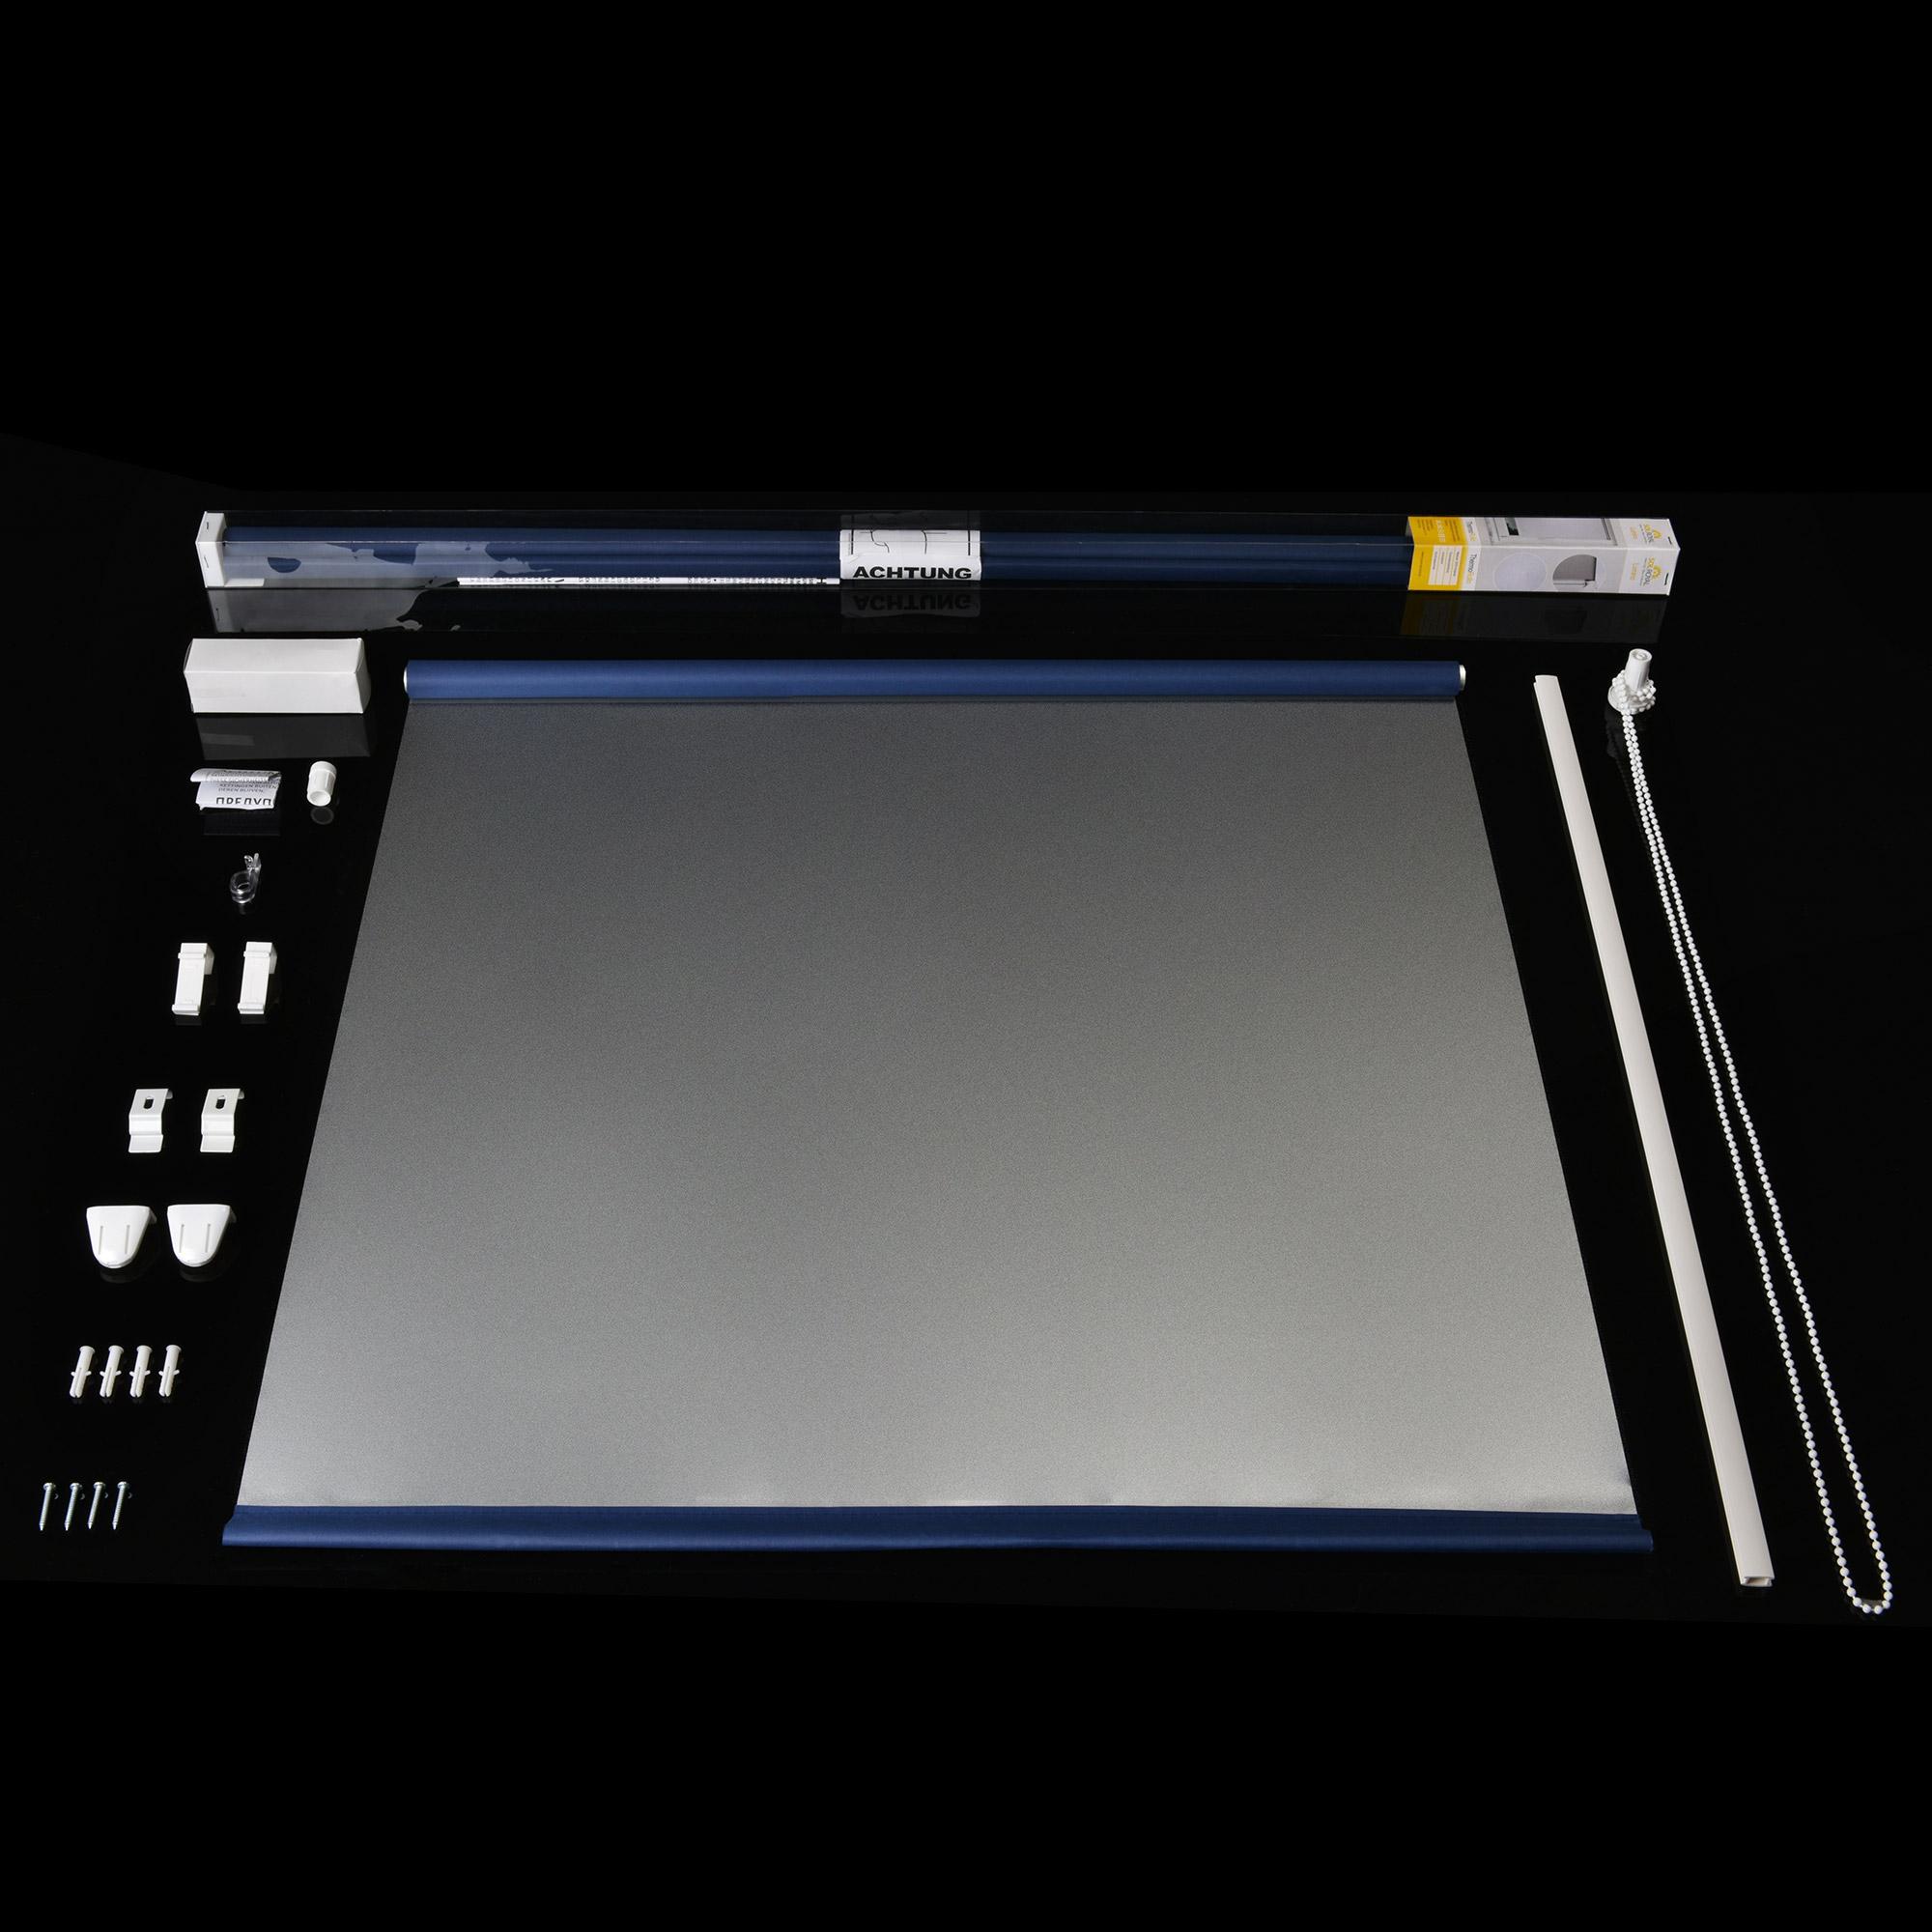 thermorollo klemmfix ohne bohren verdunkelungsrollo thermo. Black Bedroom Furniture Sets. Home Design Ideas